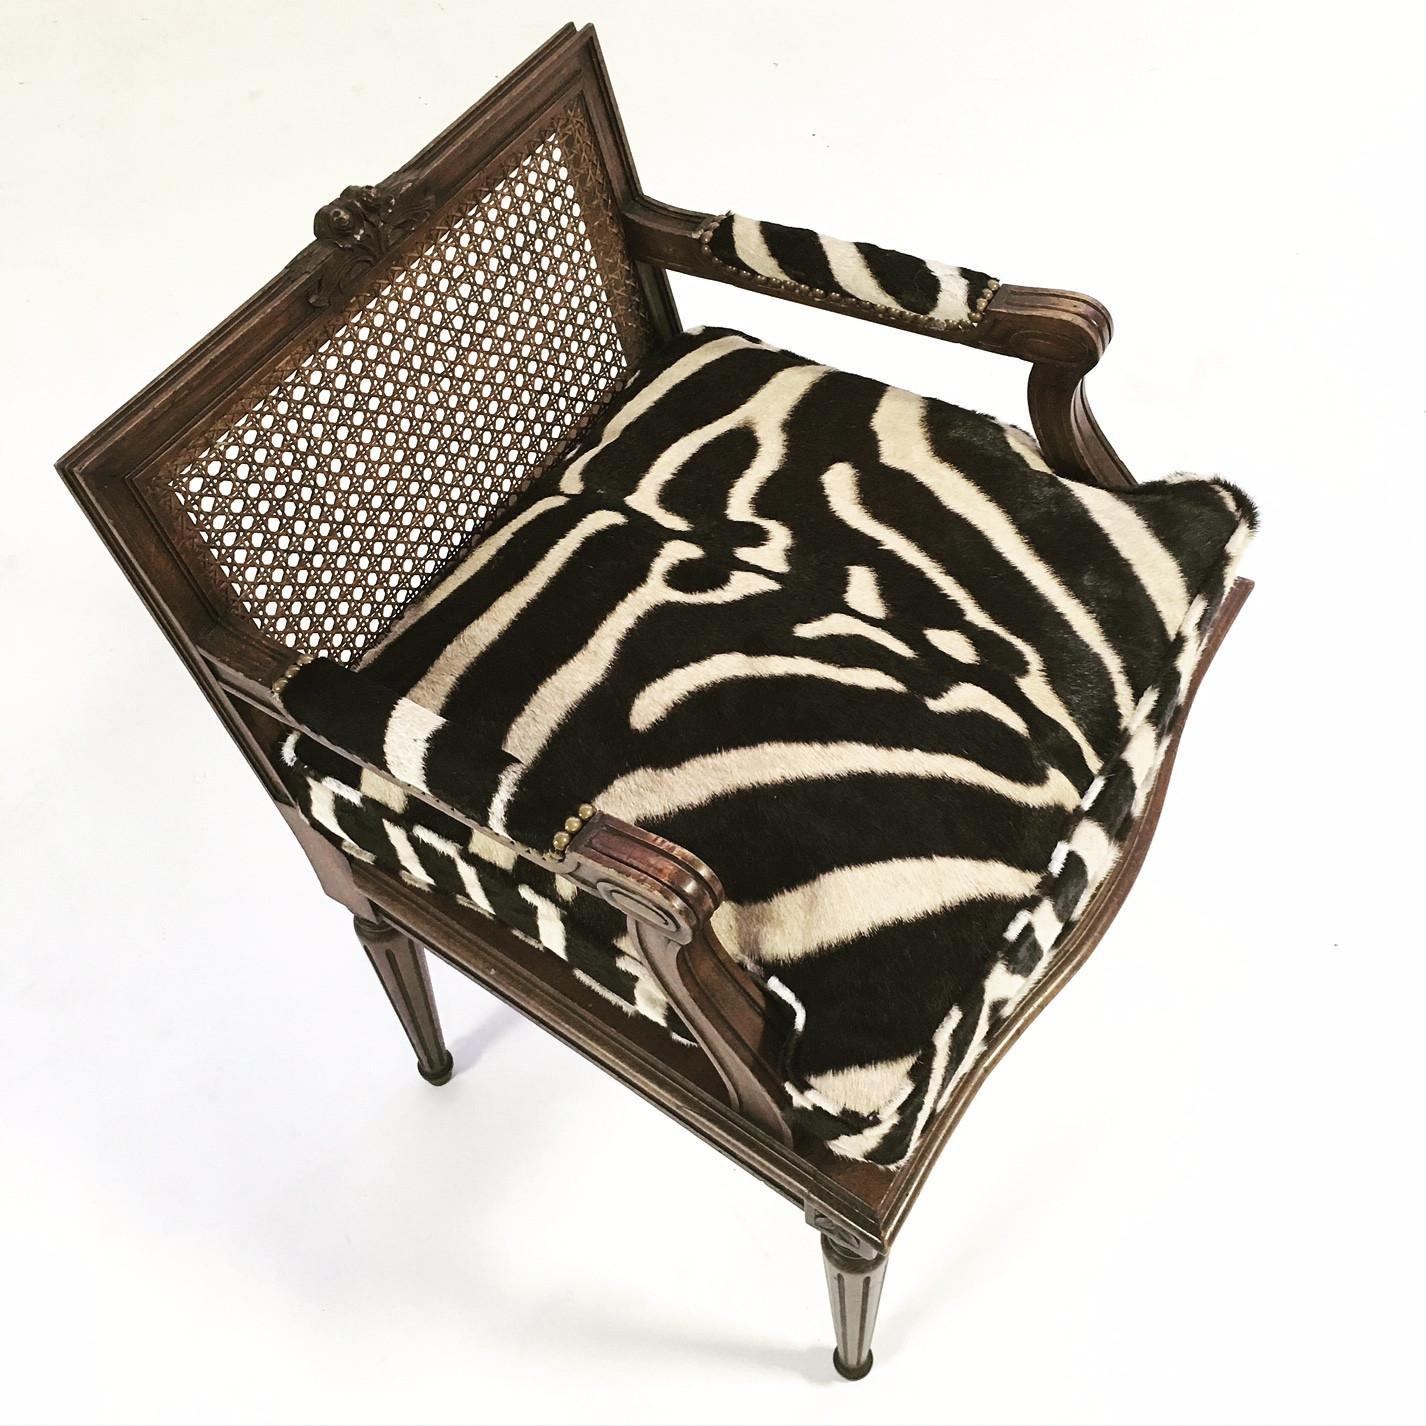 French Louis XVI Style Boudoir Chair